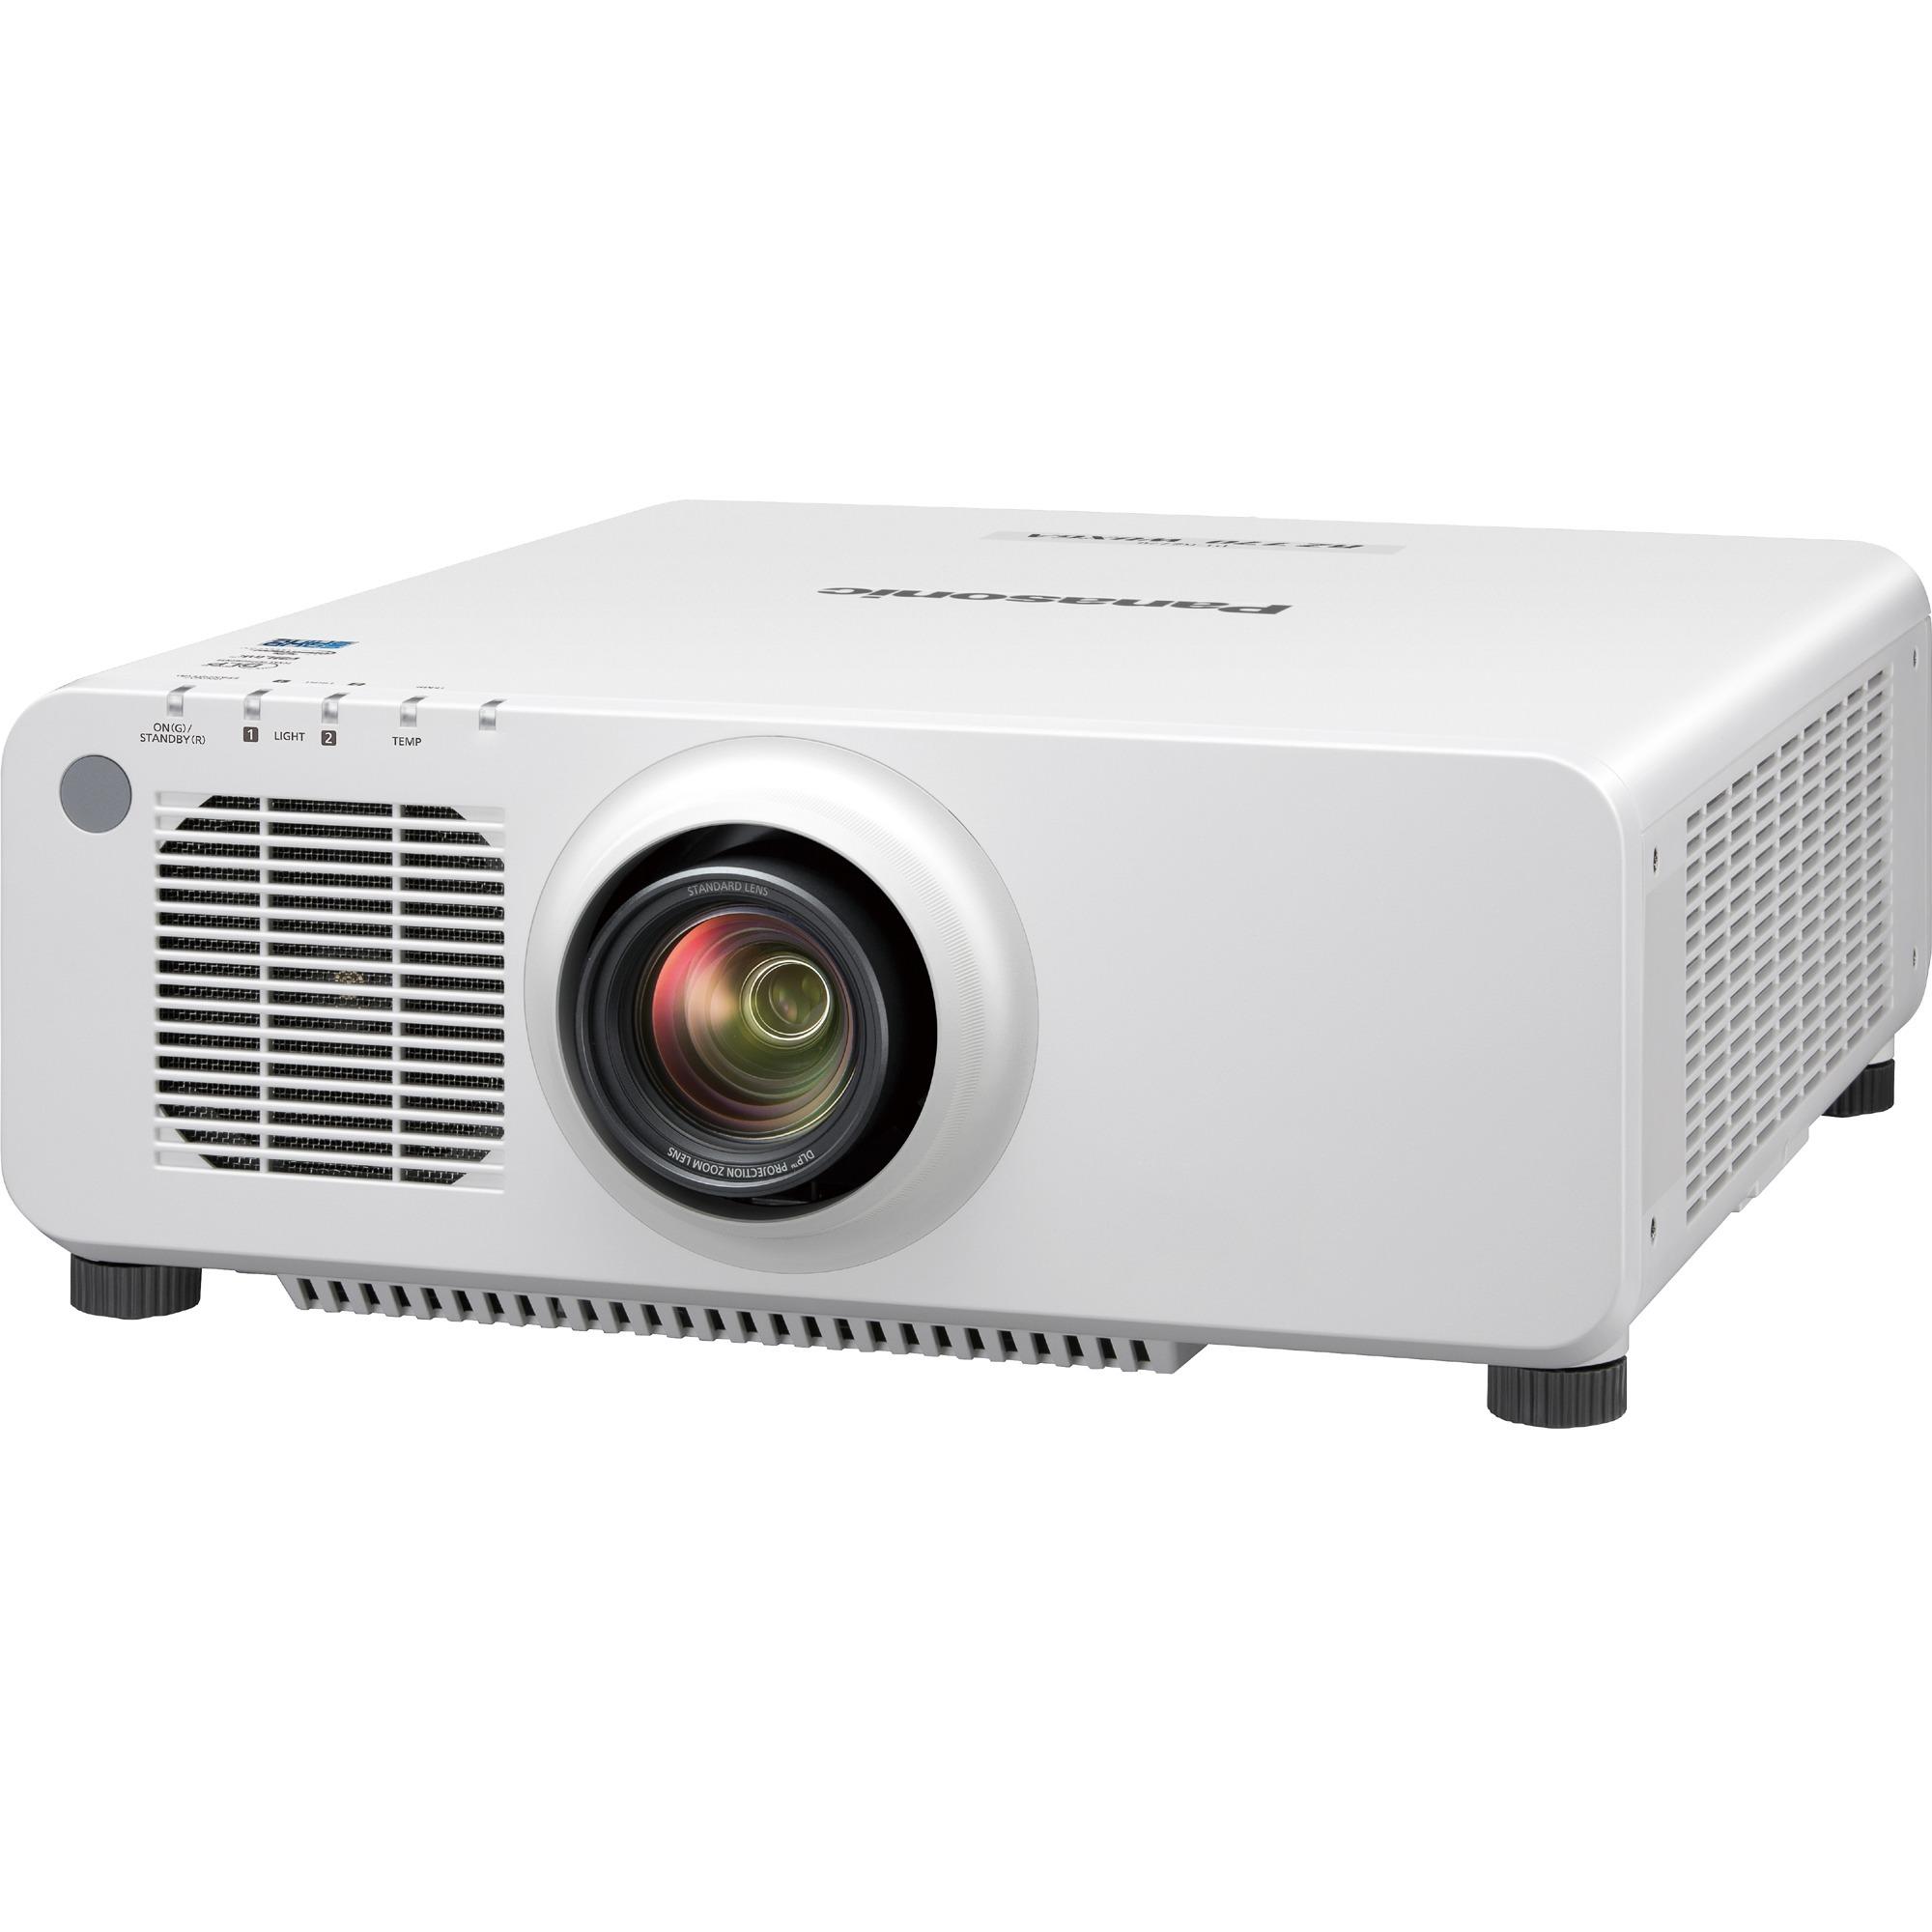 Panasonic SOLID SHINE PT-RZ770 DLP Projector - 16:10 - White_subImage_1